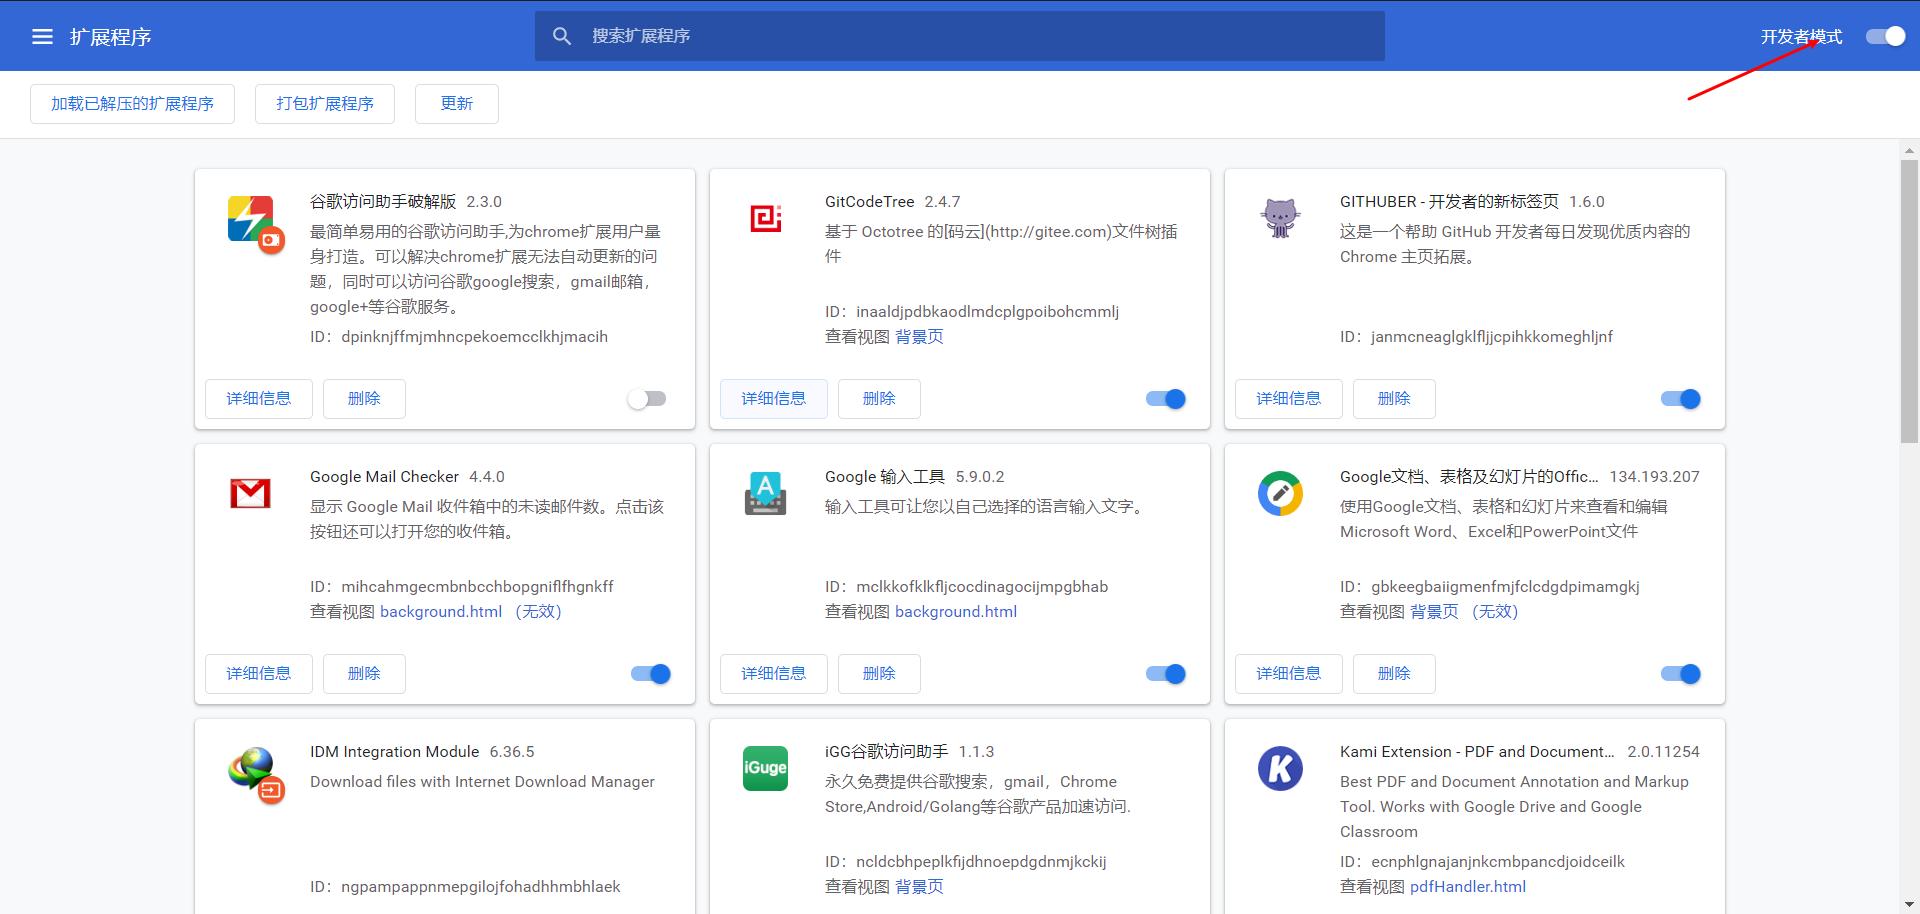 【Google】Google插件.crx文件无效解决方法-icbug创客